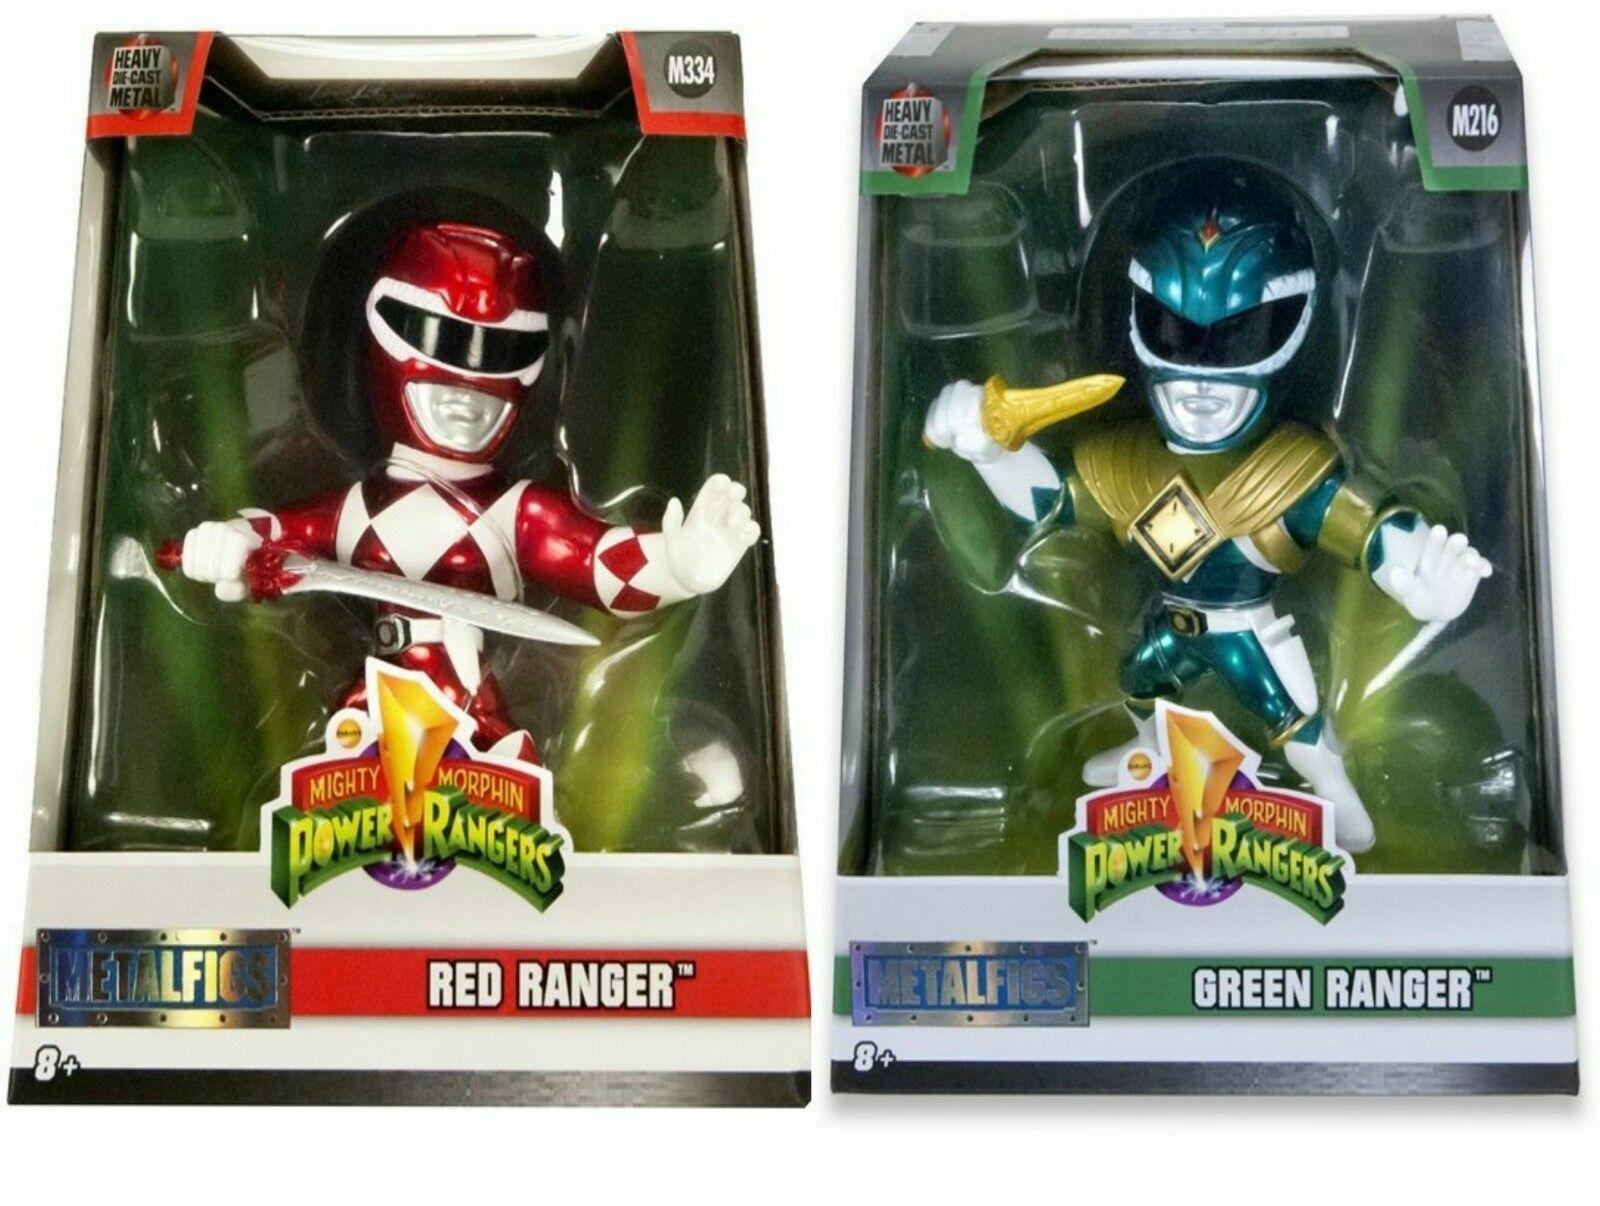 Mighty Morphin Power Rangers metales Coleccionable DIE-CAST figura Green Ranger